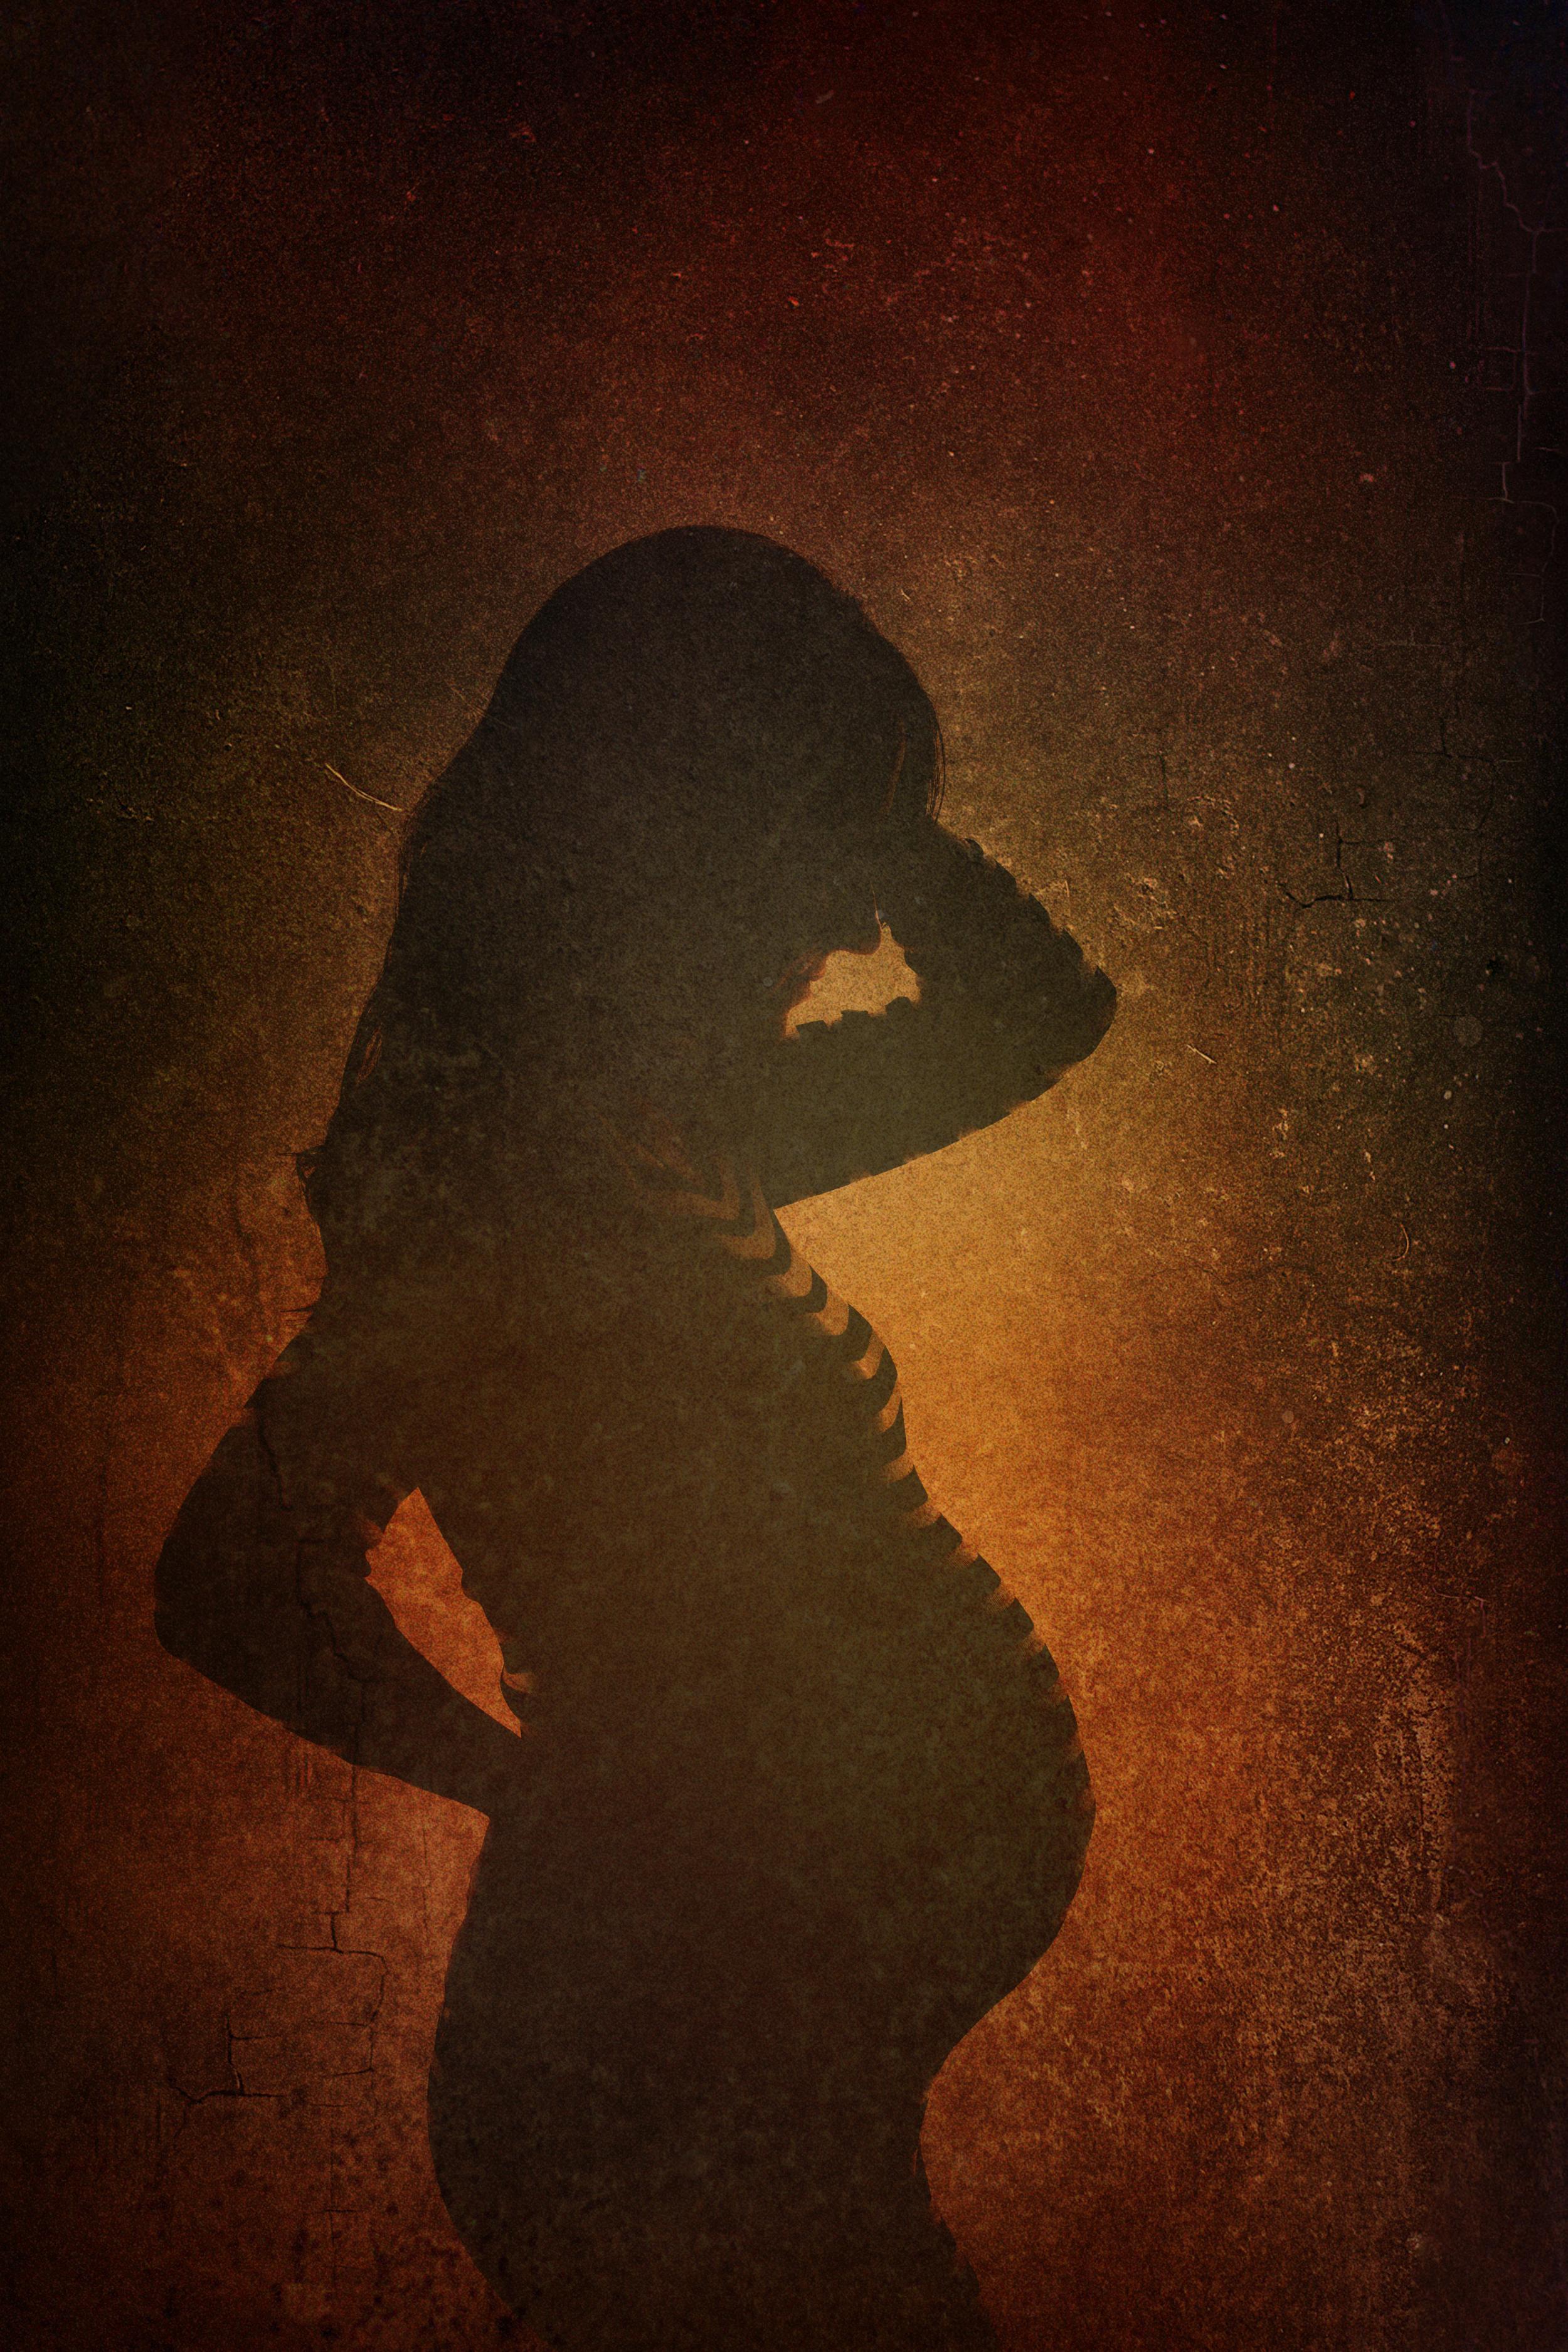 052 Karlie Maternity edit2.jpg